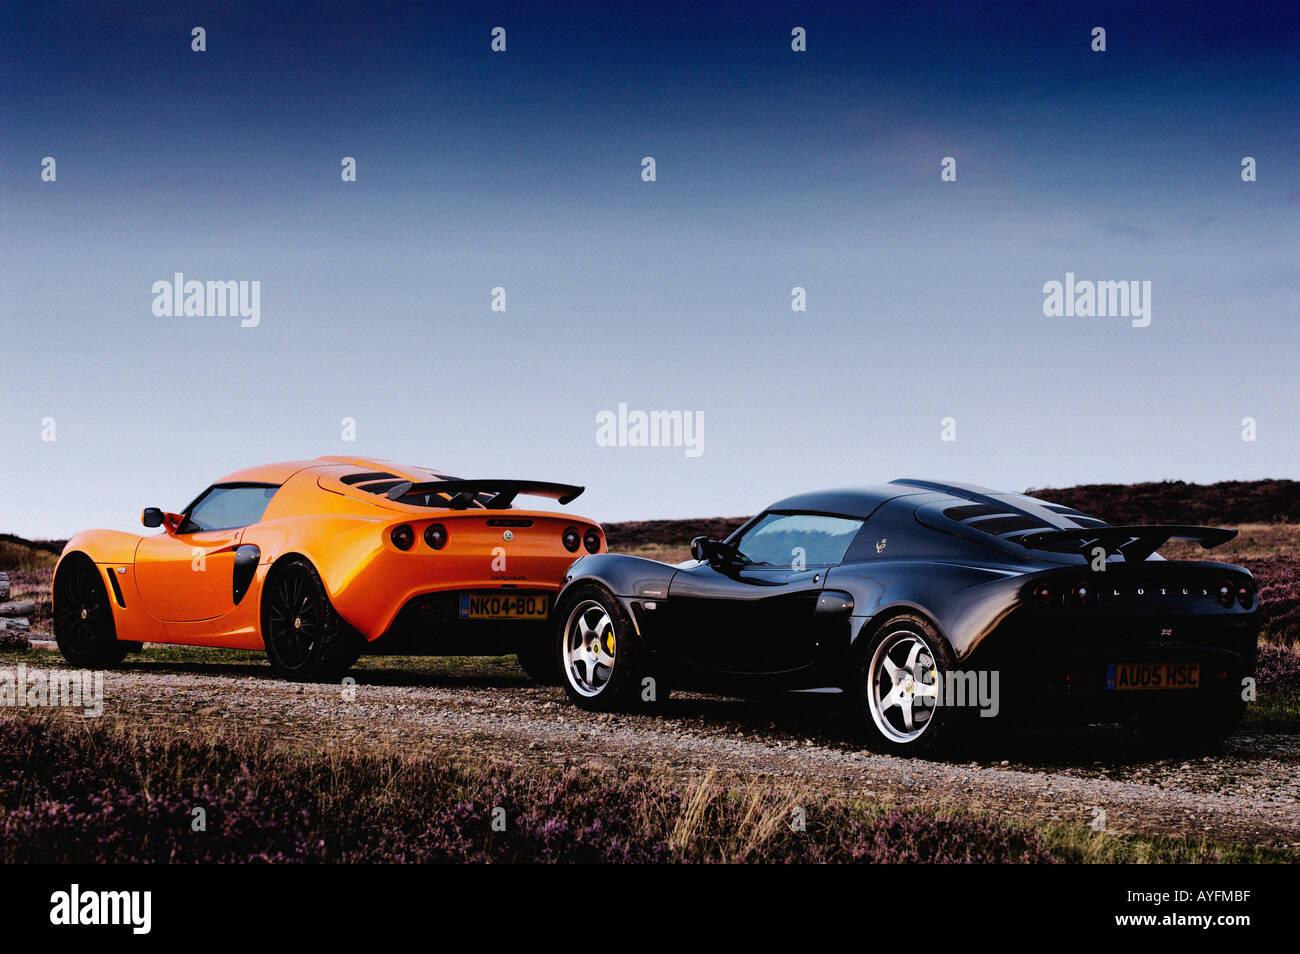 Lotus Exige Cars   Stock Image